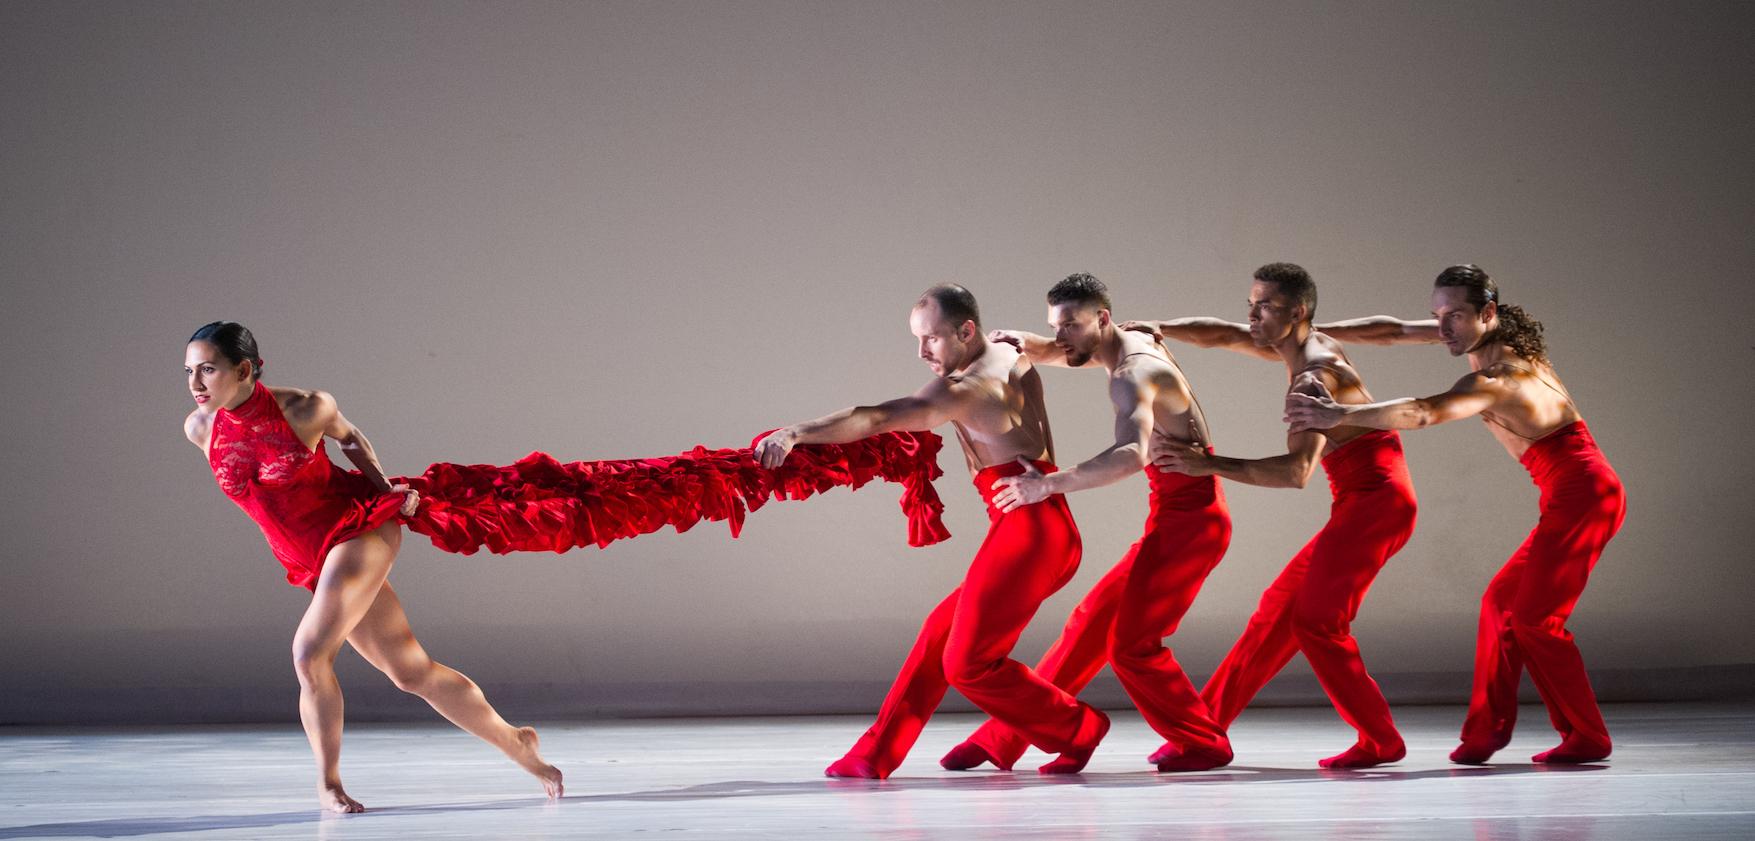 Linea Recta by Ballet Hispánico. Photo: Paula Lobo